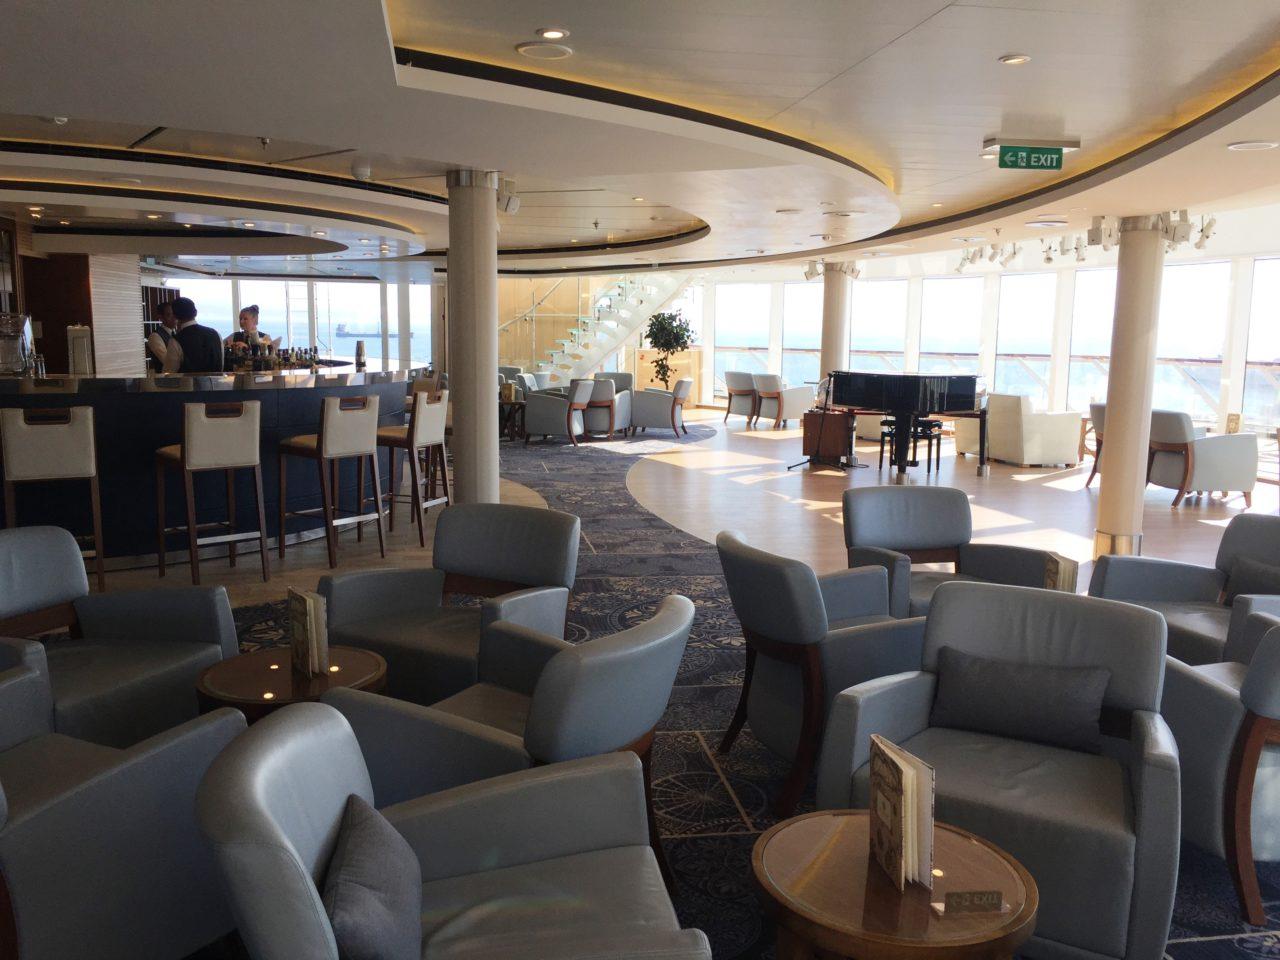 <em><strong>Viking Ocean Cruise Ships ~</strong> </em> Explorer's Lounge on the <em><strong>Viking Star</strong></em>